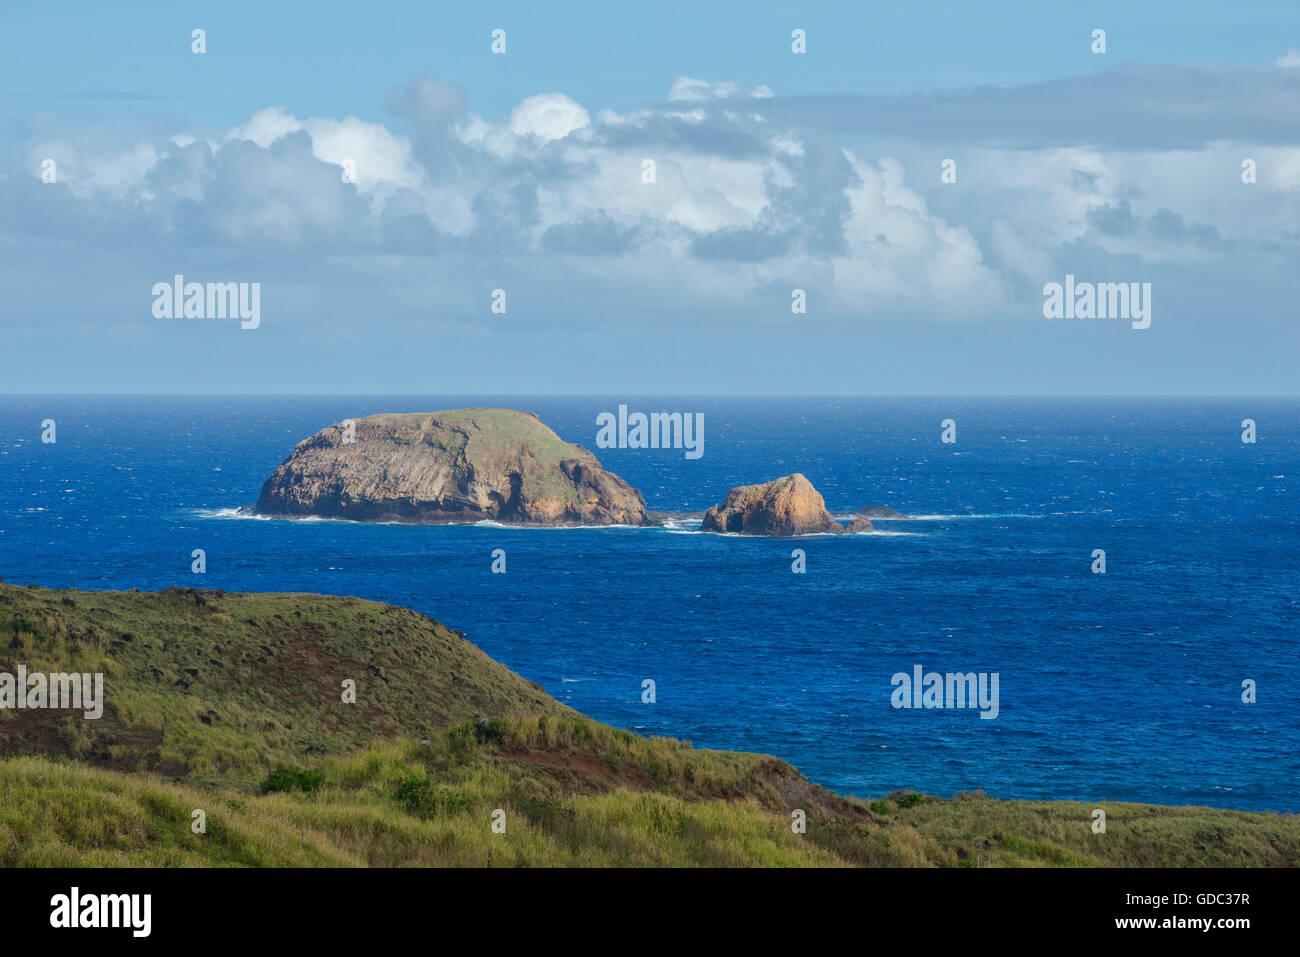 USA,Hawaii,Molokai,soutside of the island Stock Photo